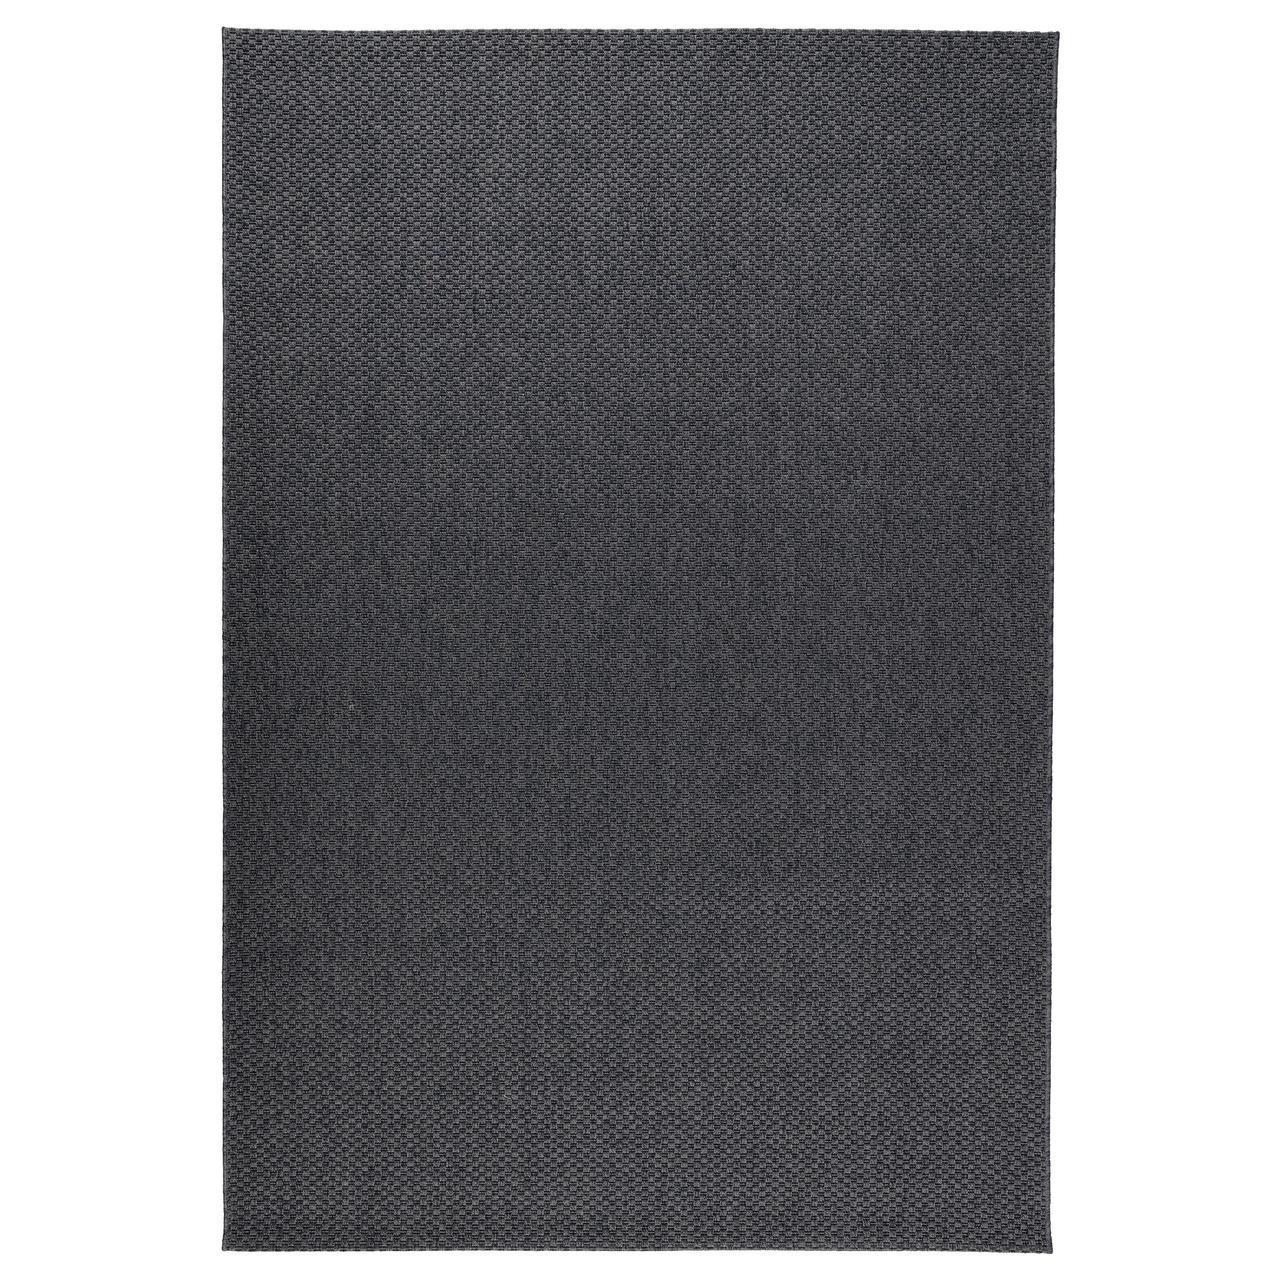 IKEA MORUM (301.982.93) Ковер, внутри/снаружи темно-серый